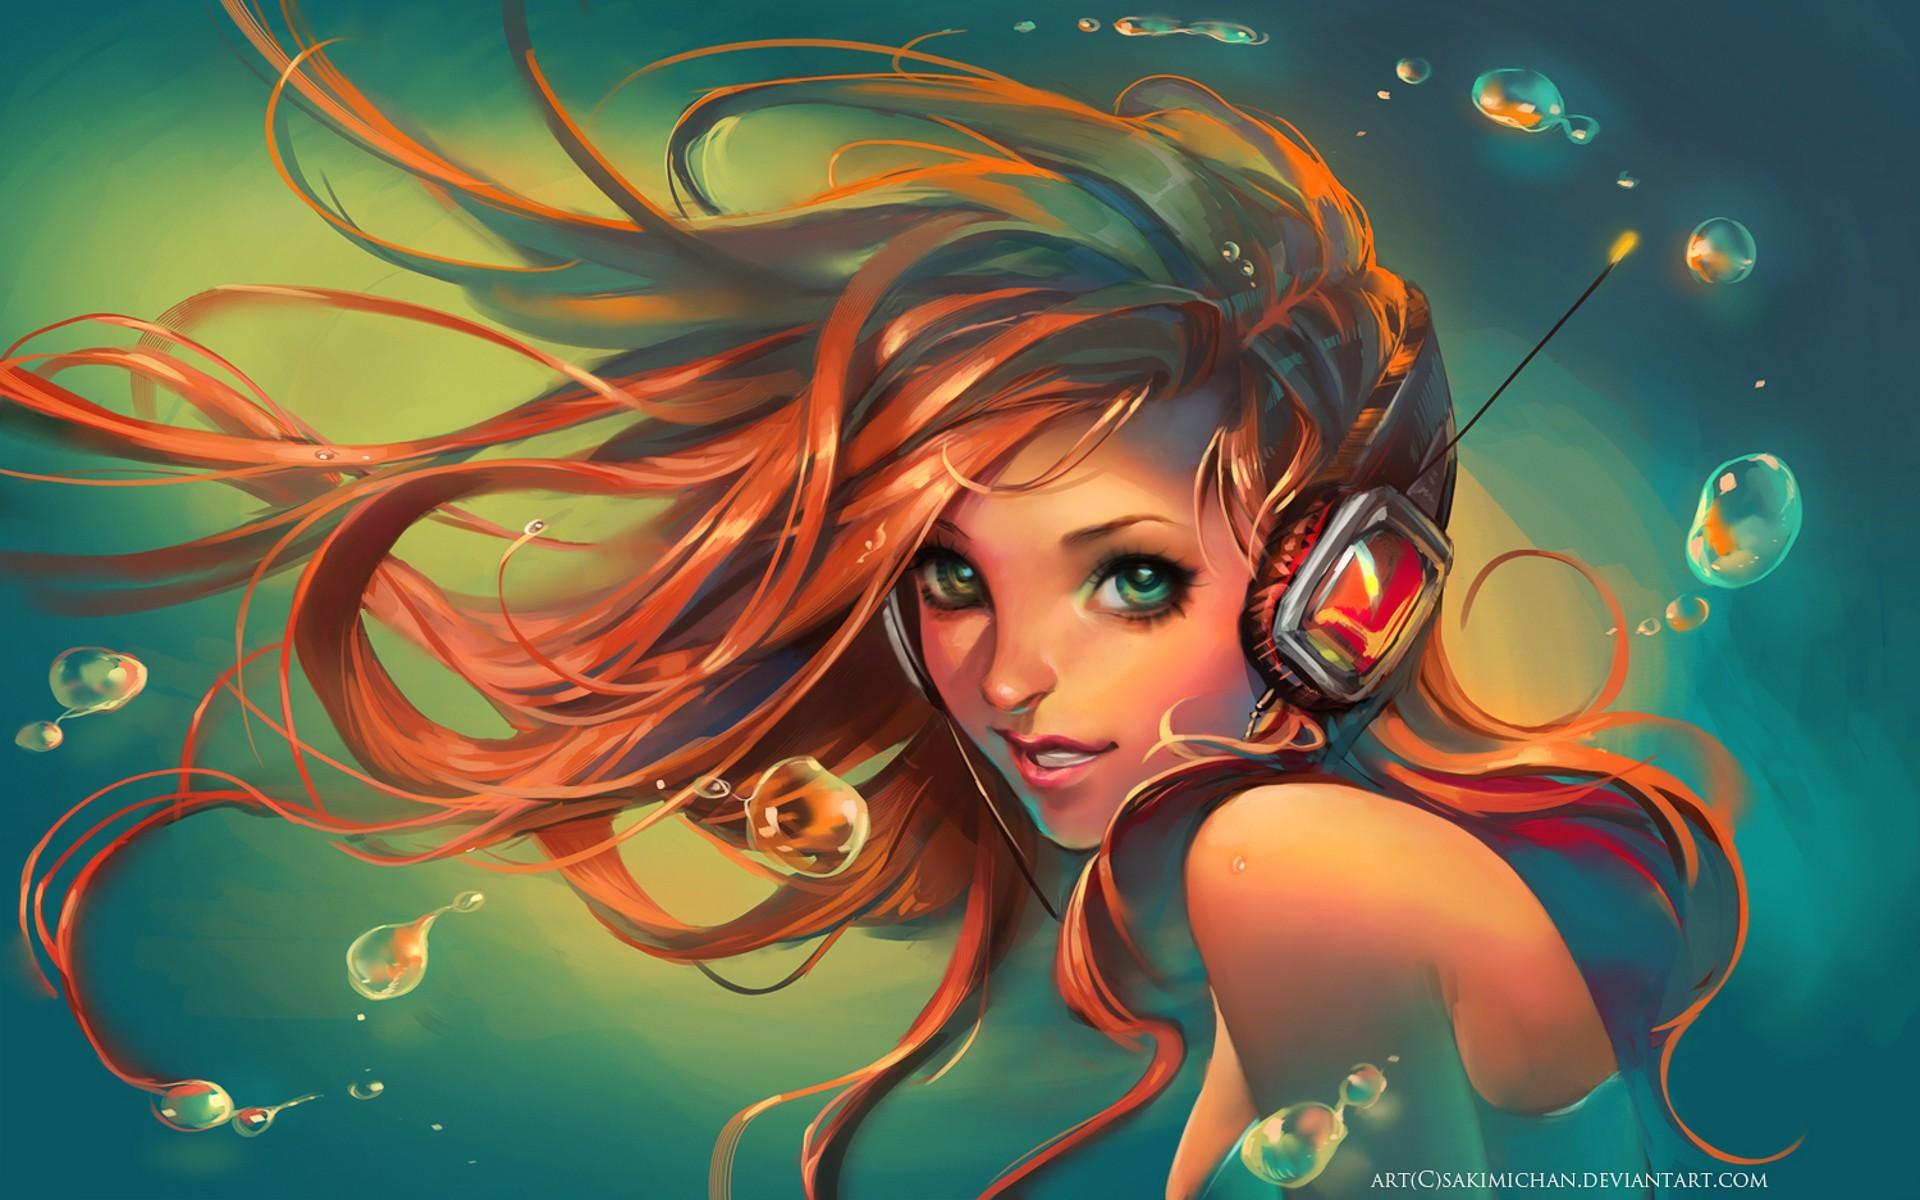 General 1920x1200 artwork women Sakimichan anime girls anime headphones bubbles face blue background long hair